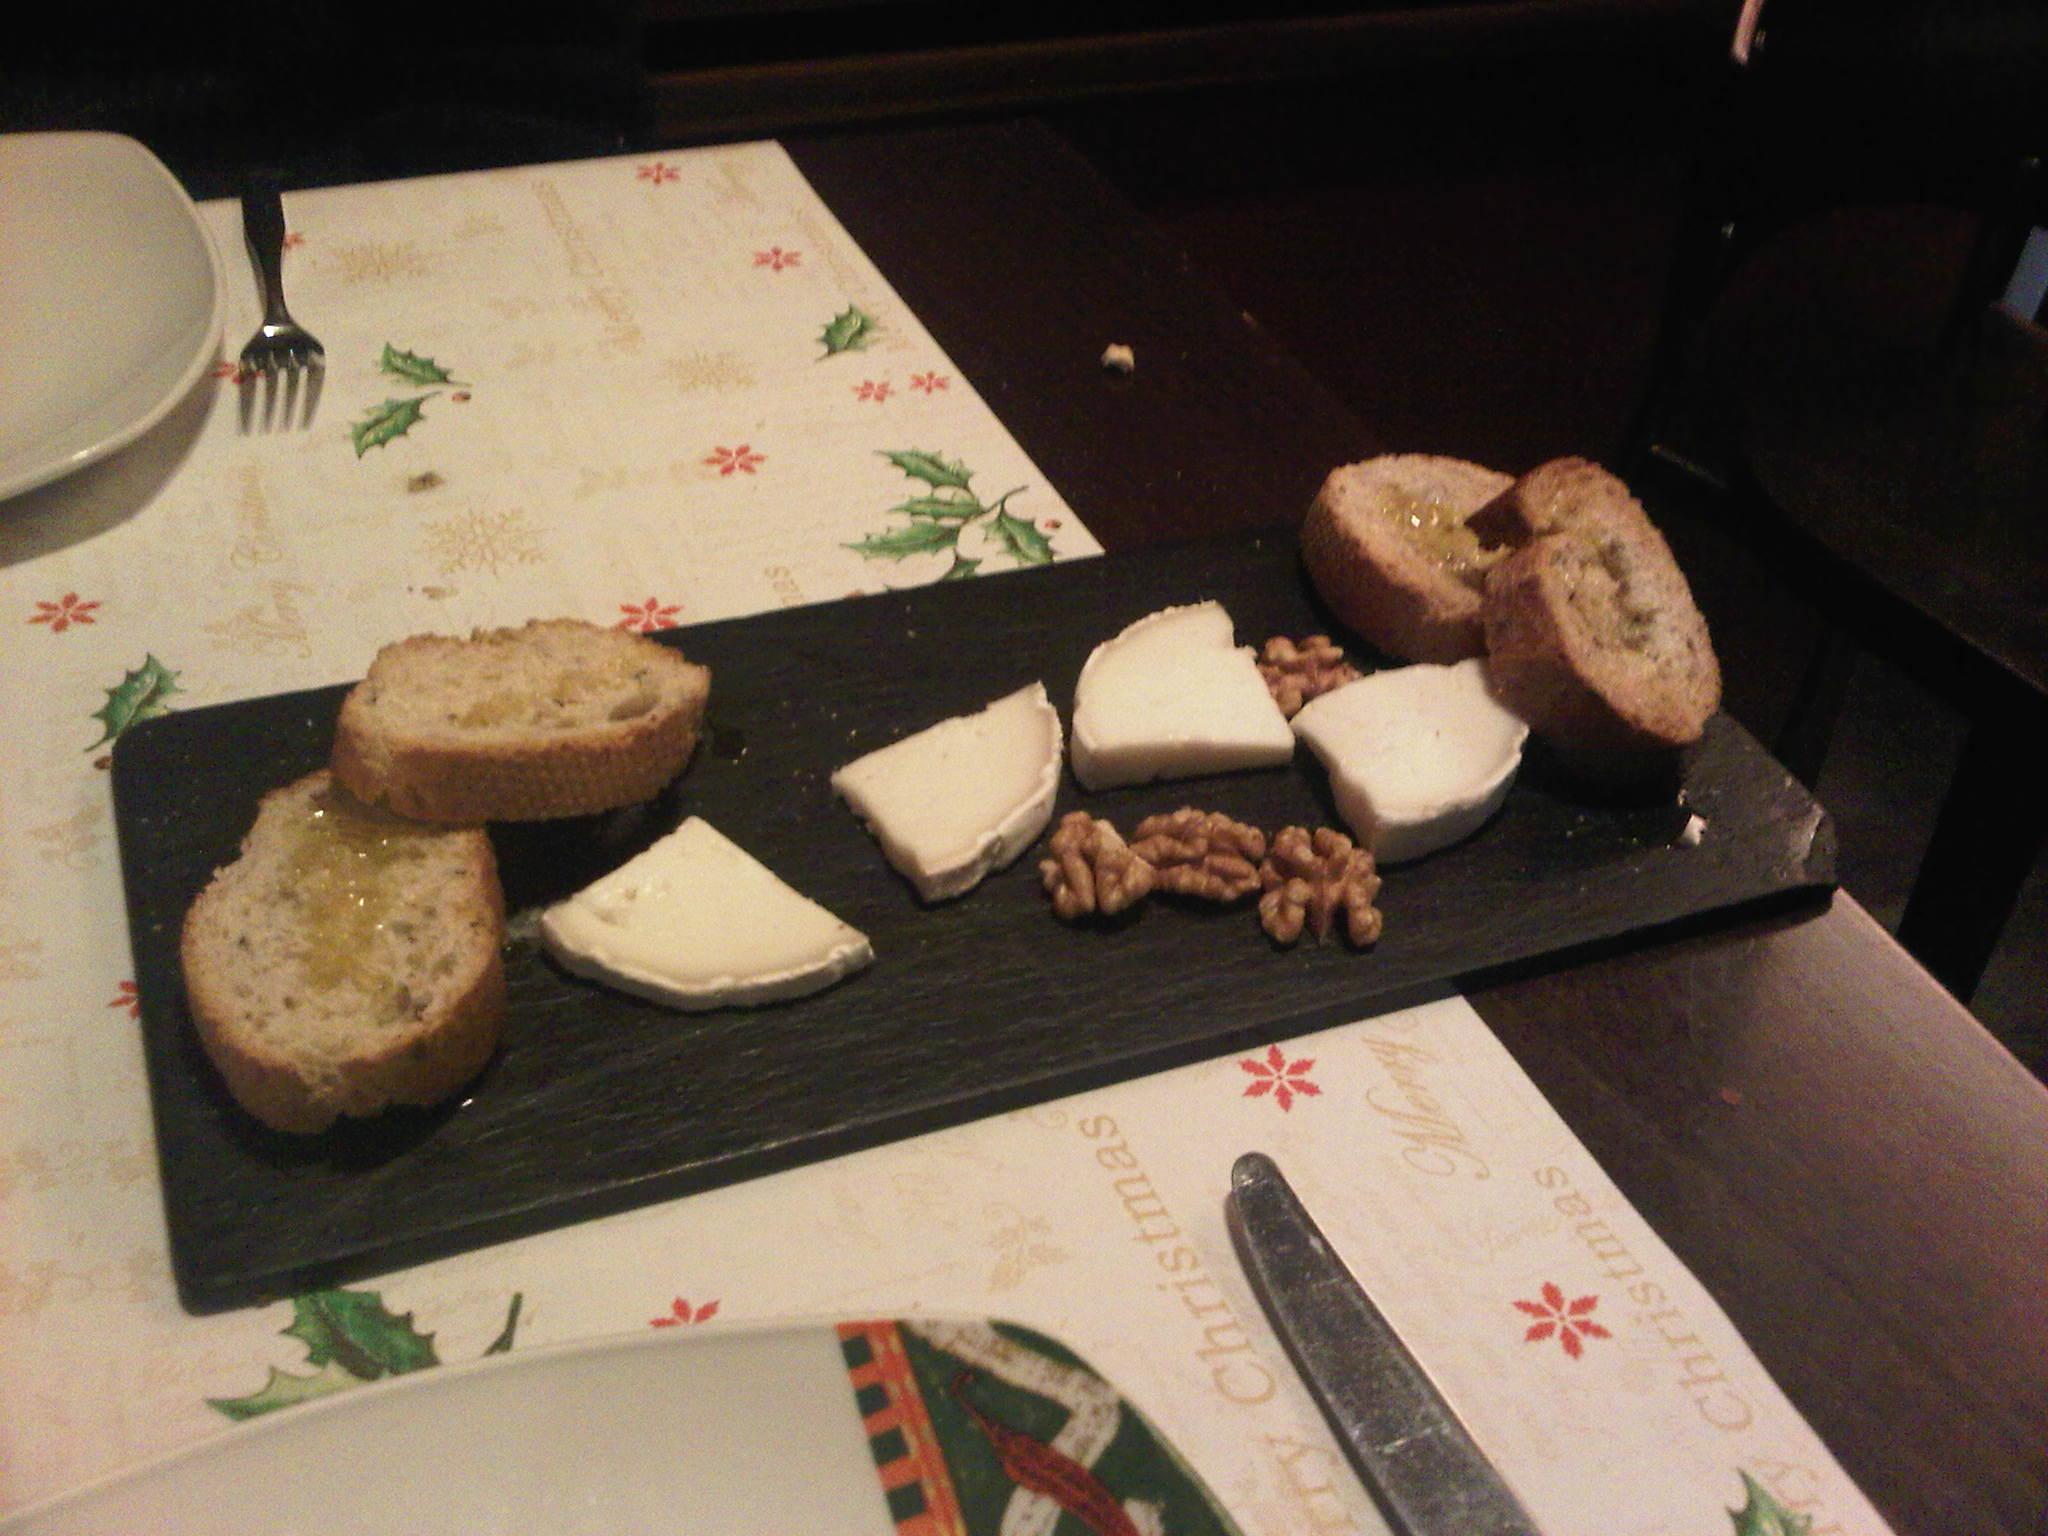 Restaurante_Palomeque_Zaragoza_Tabla_Quesos_Radiquero_Aurelio_Gómez-Miranda